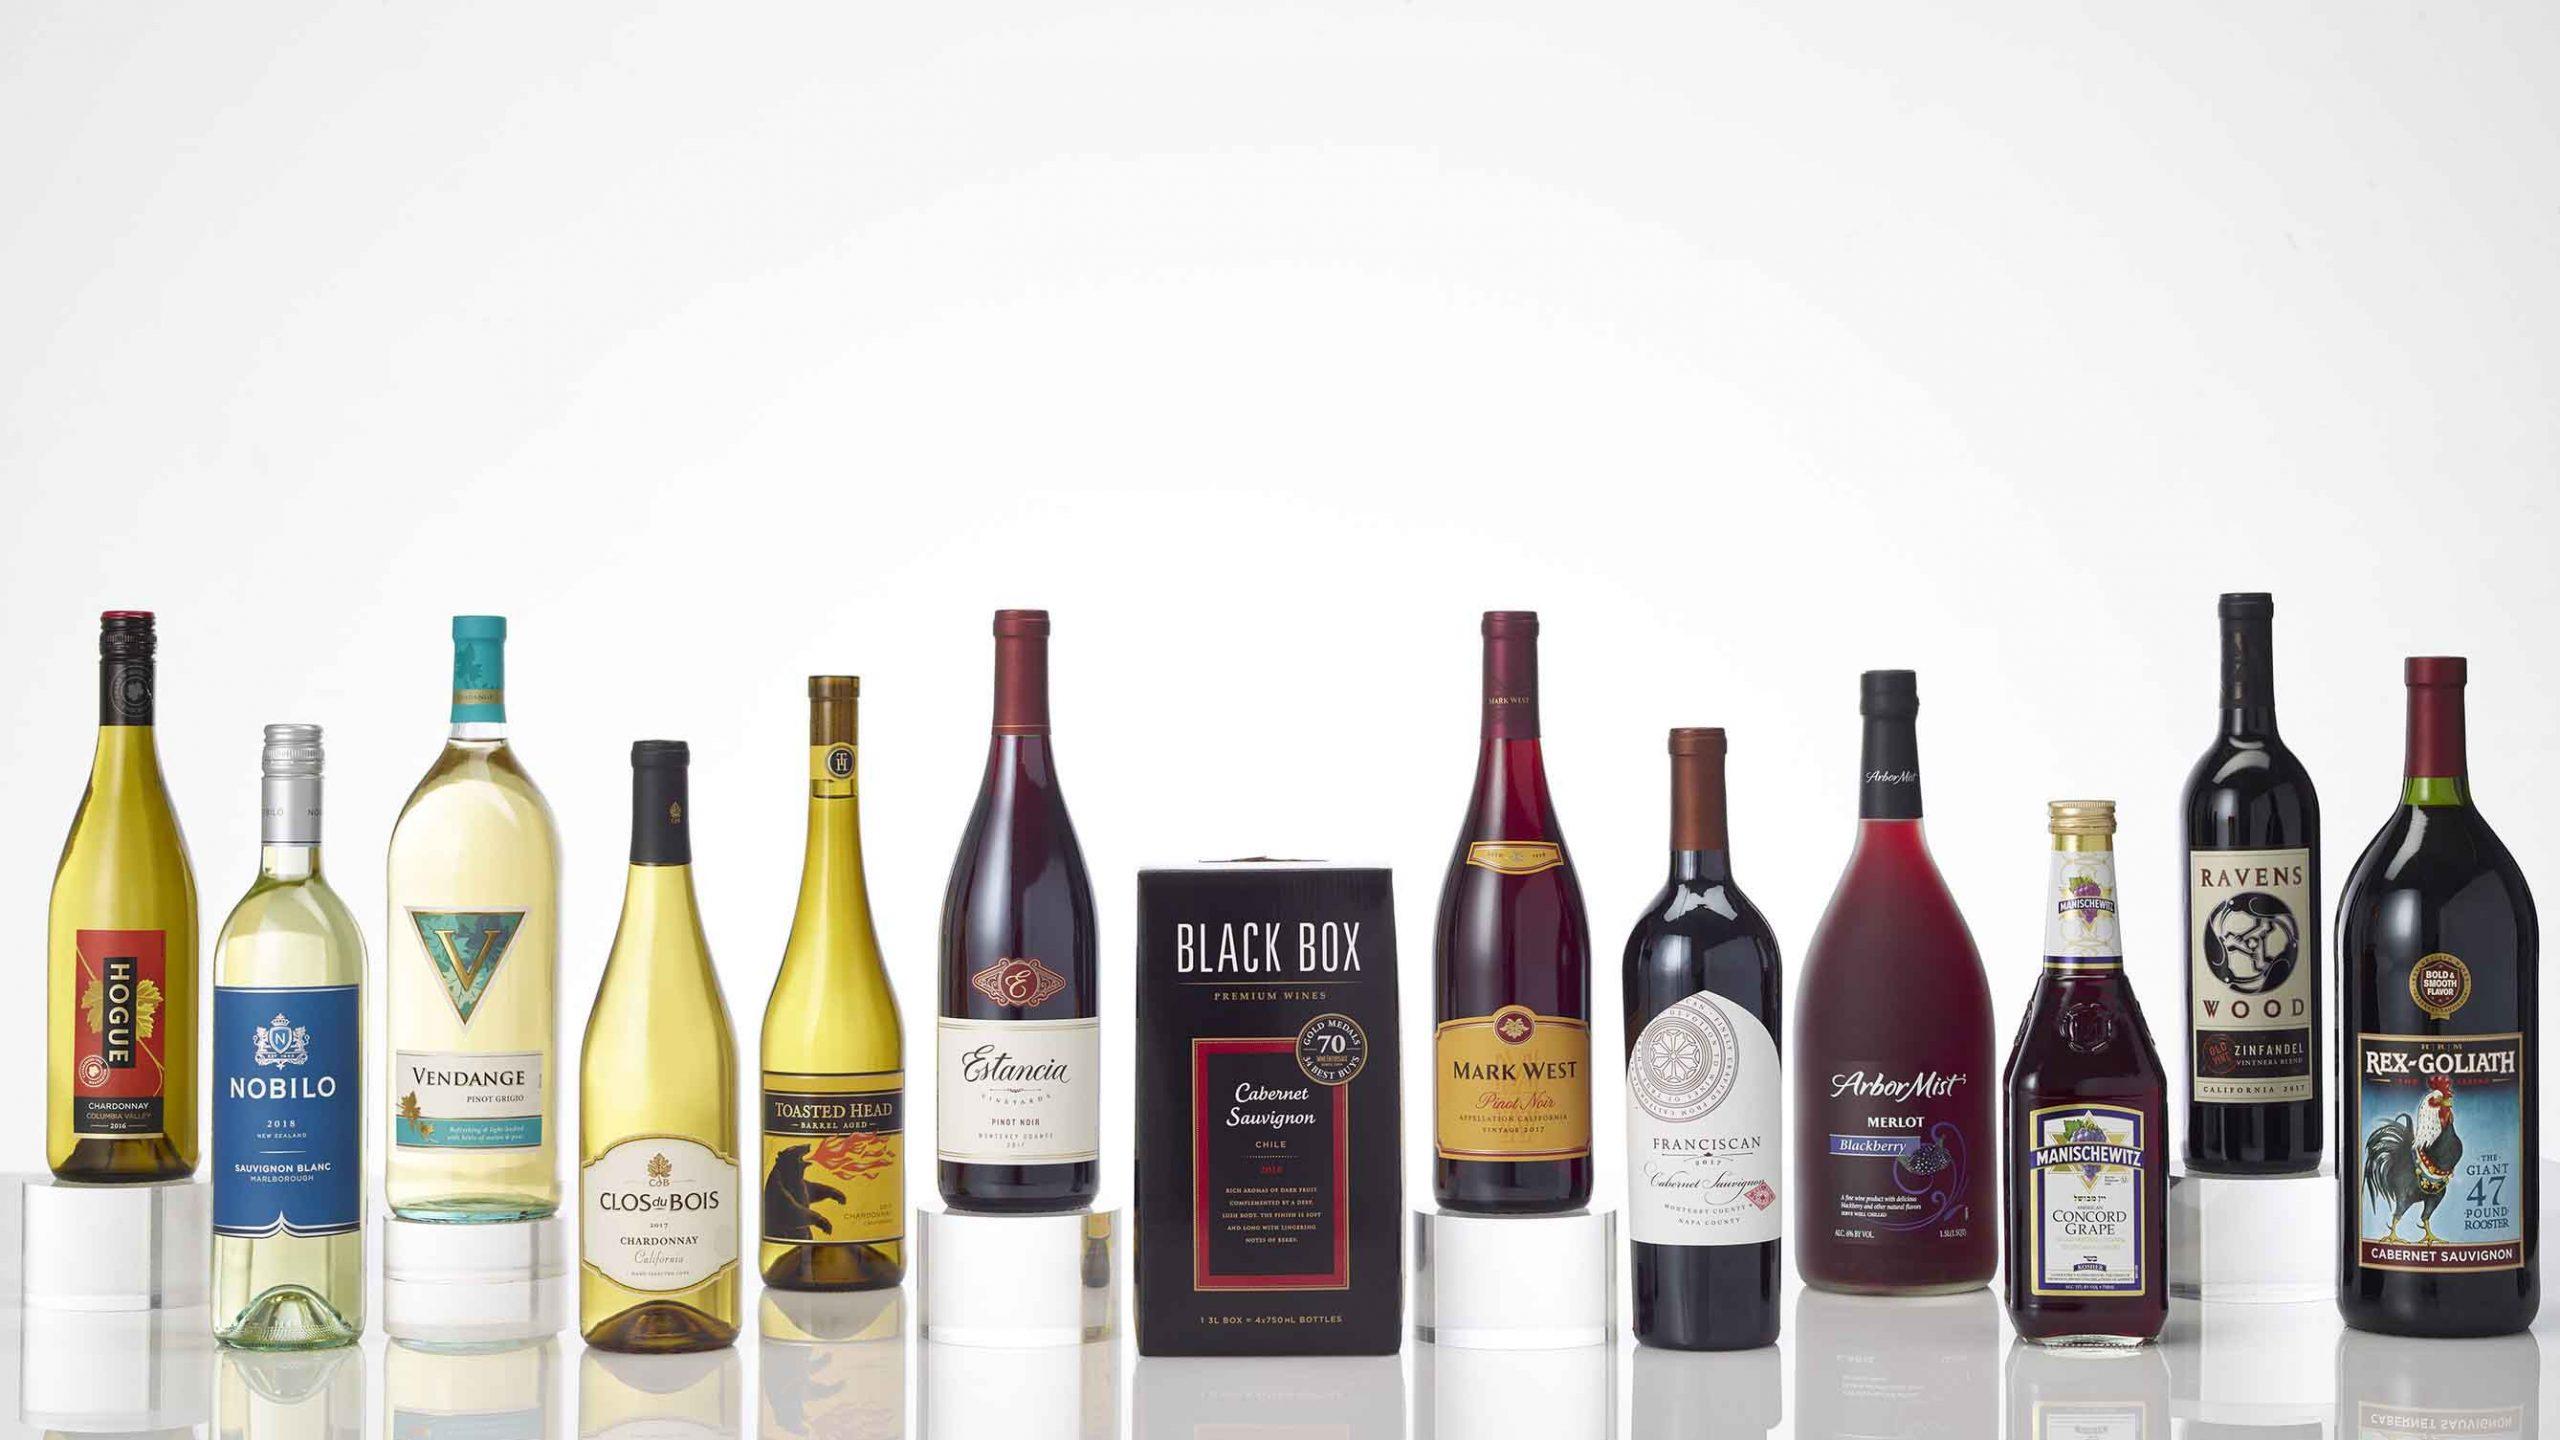 E J Gallo Winery Sirius Portfolio